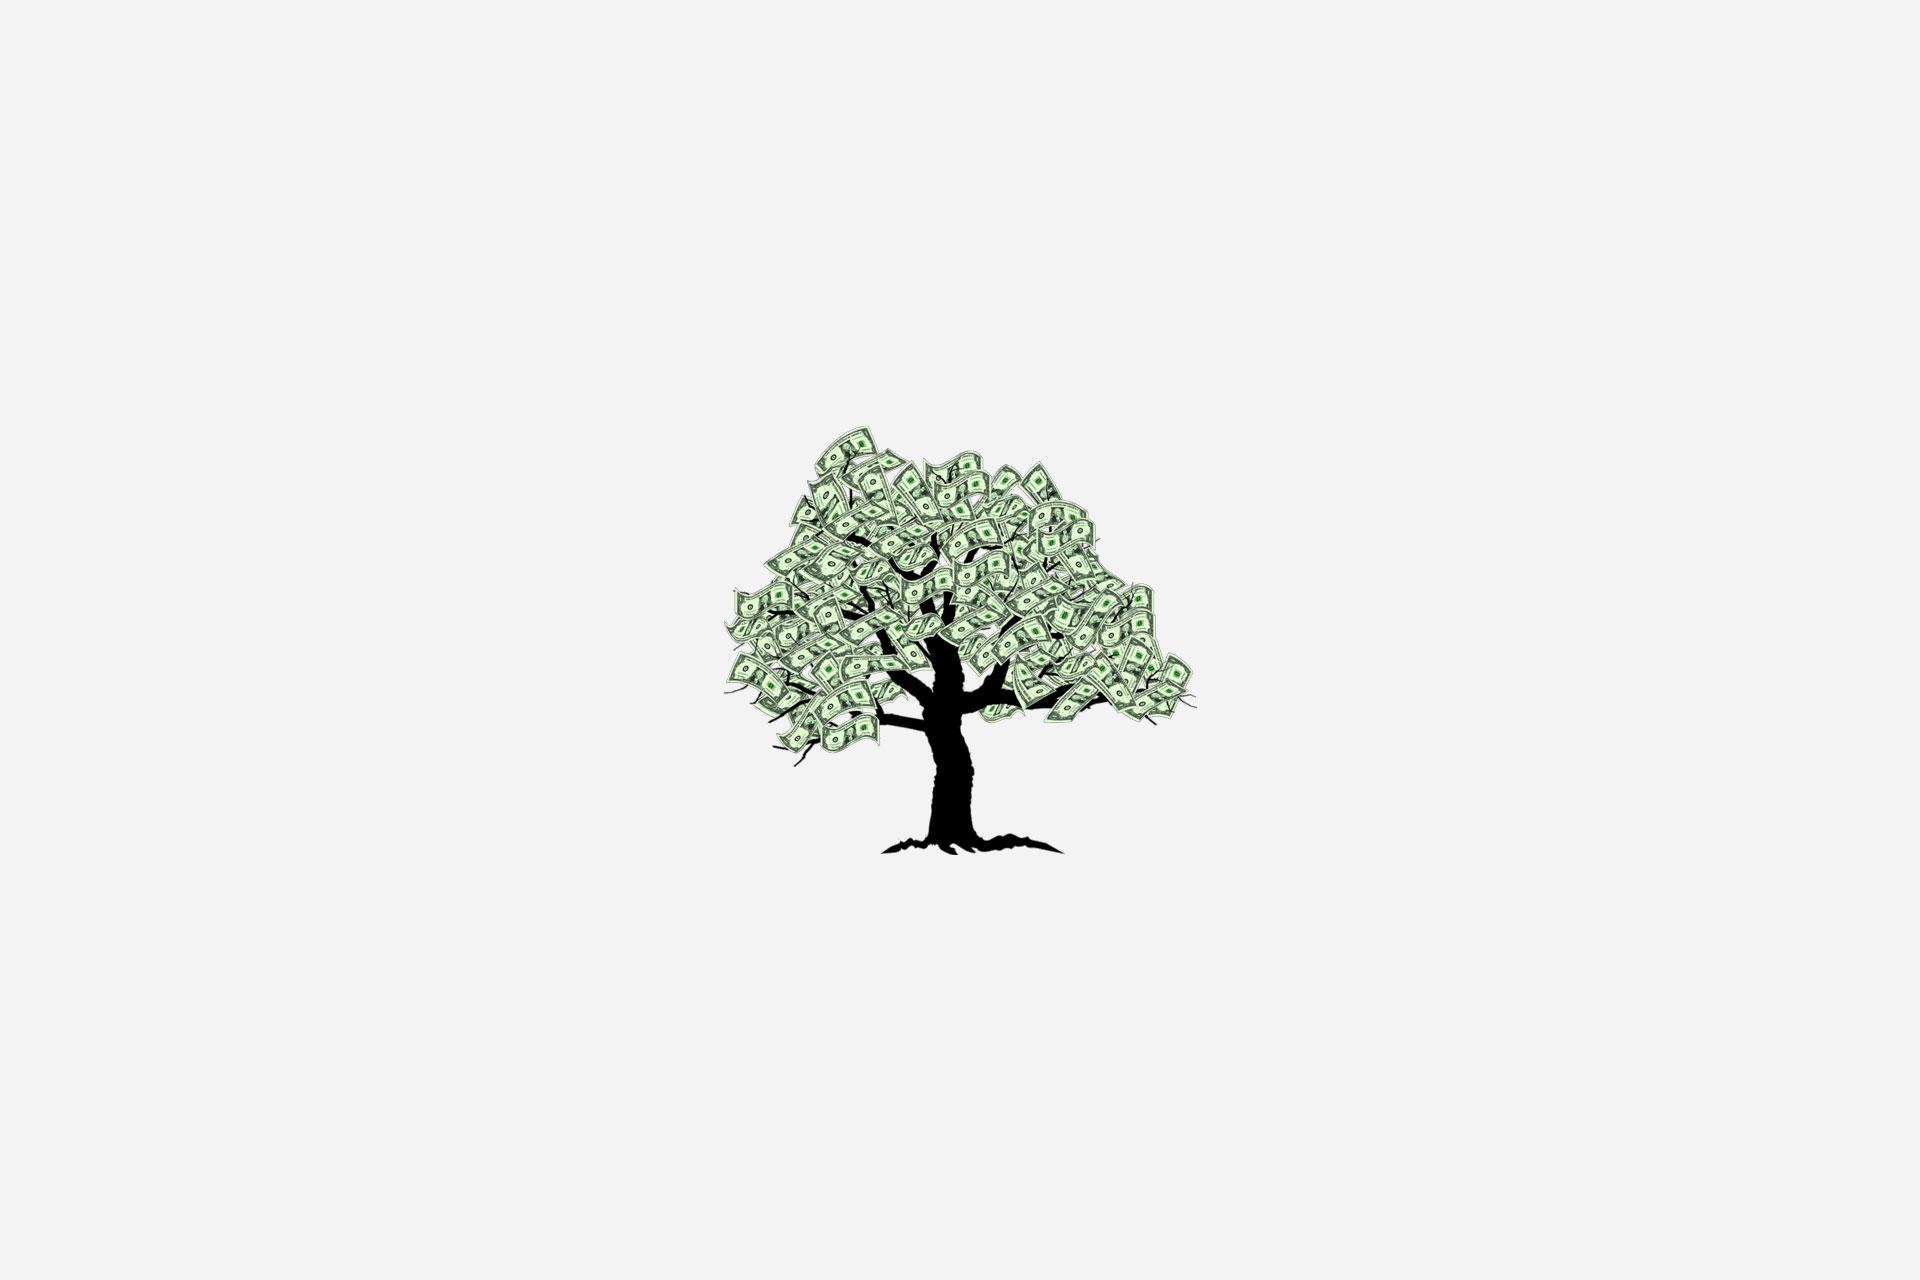 15 قانون پول, درخت پول